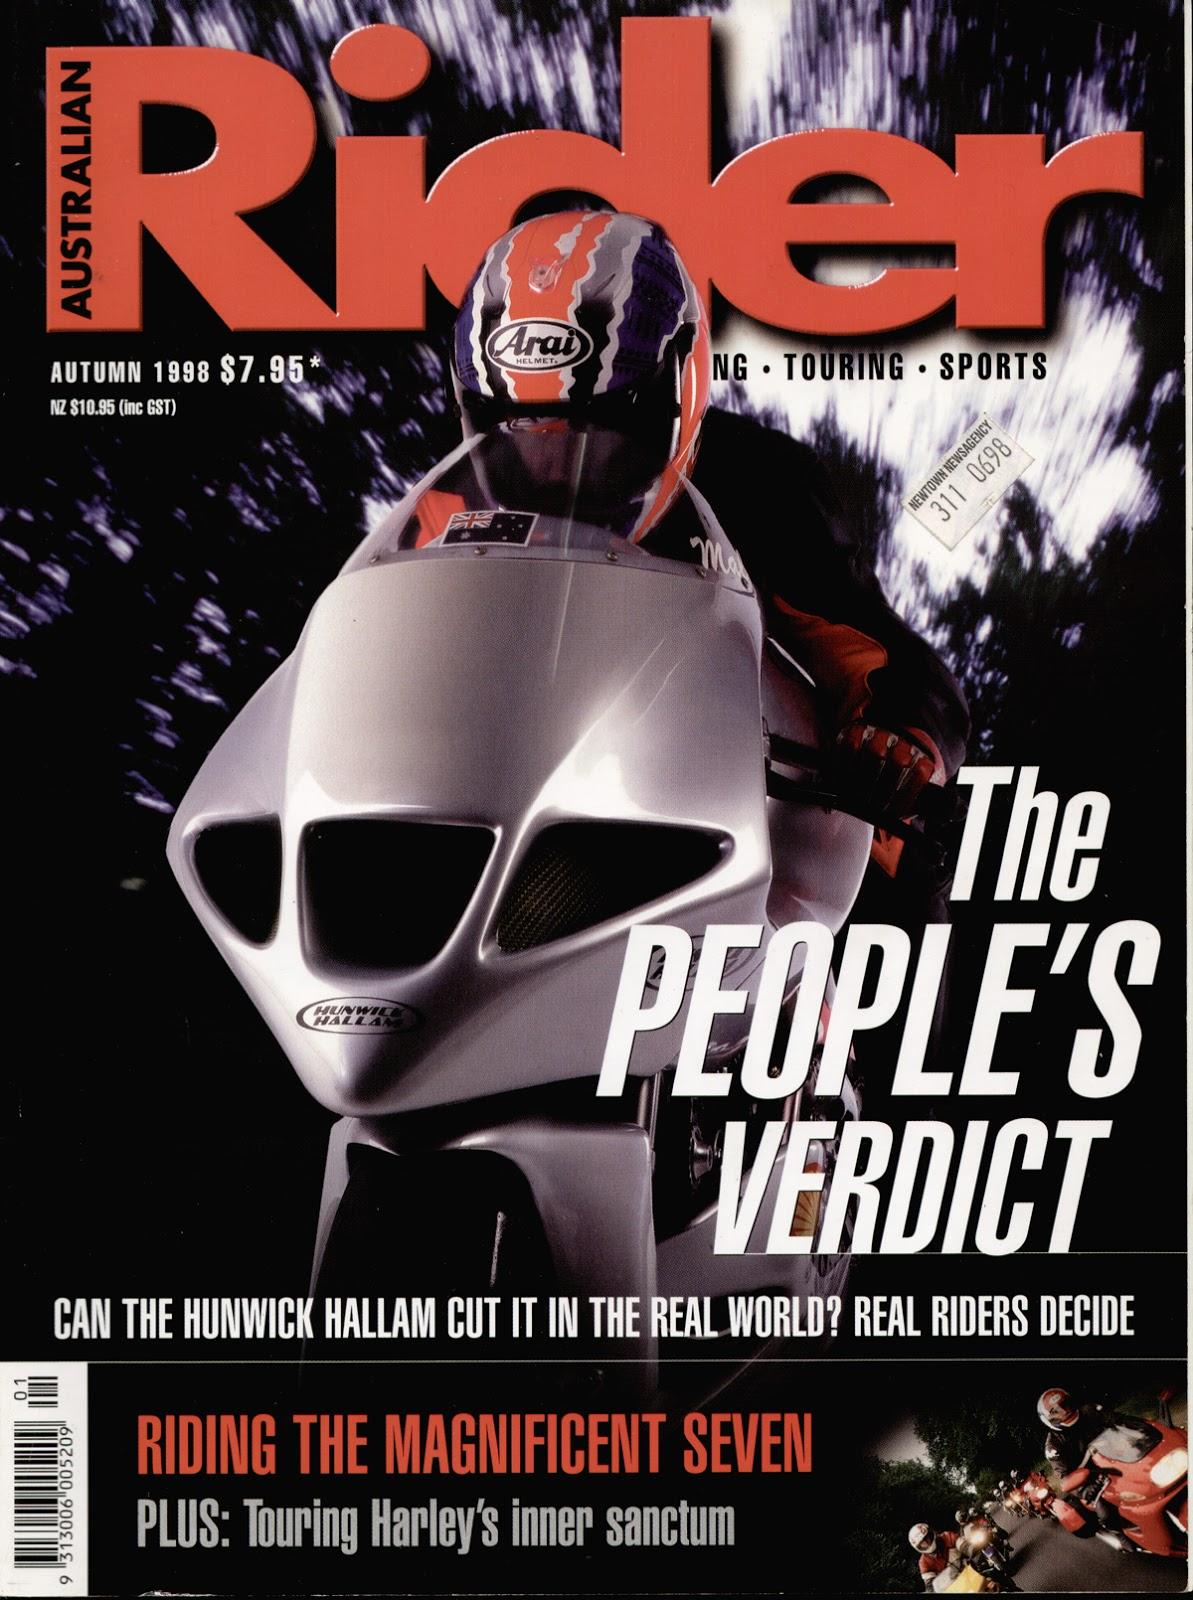 Hunwick Hallam Australian Rider Cover